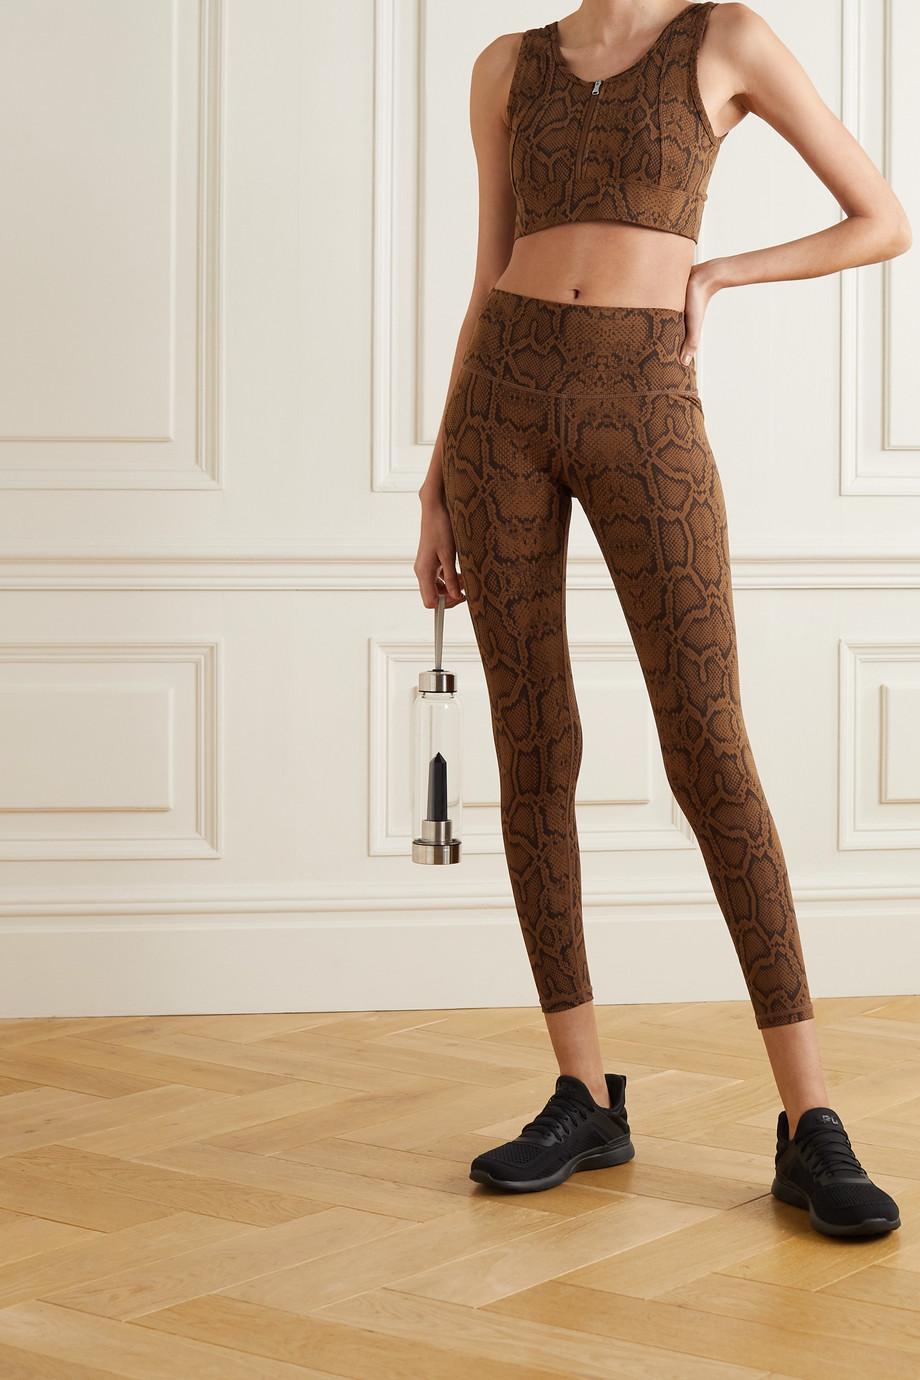 Varley Luna snake-print stretch leggings